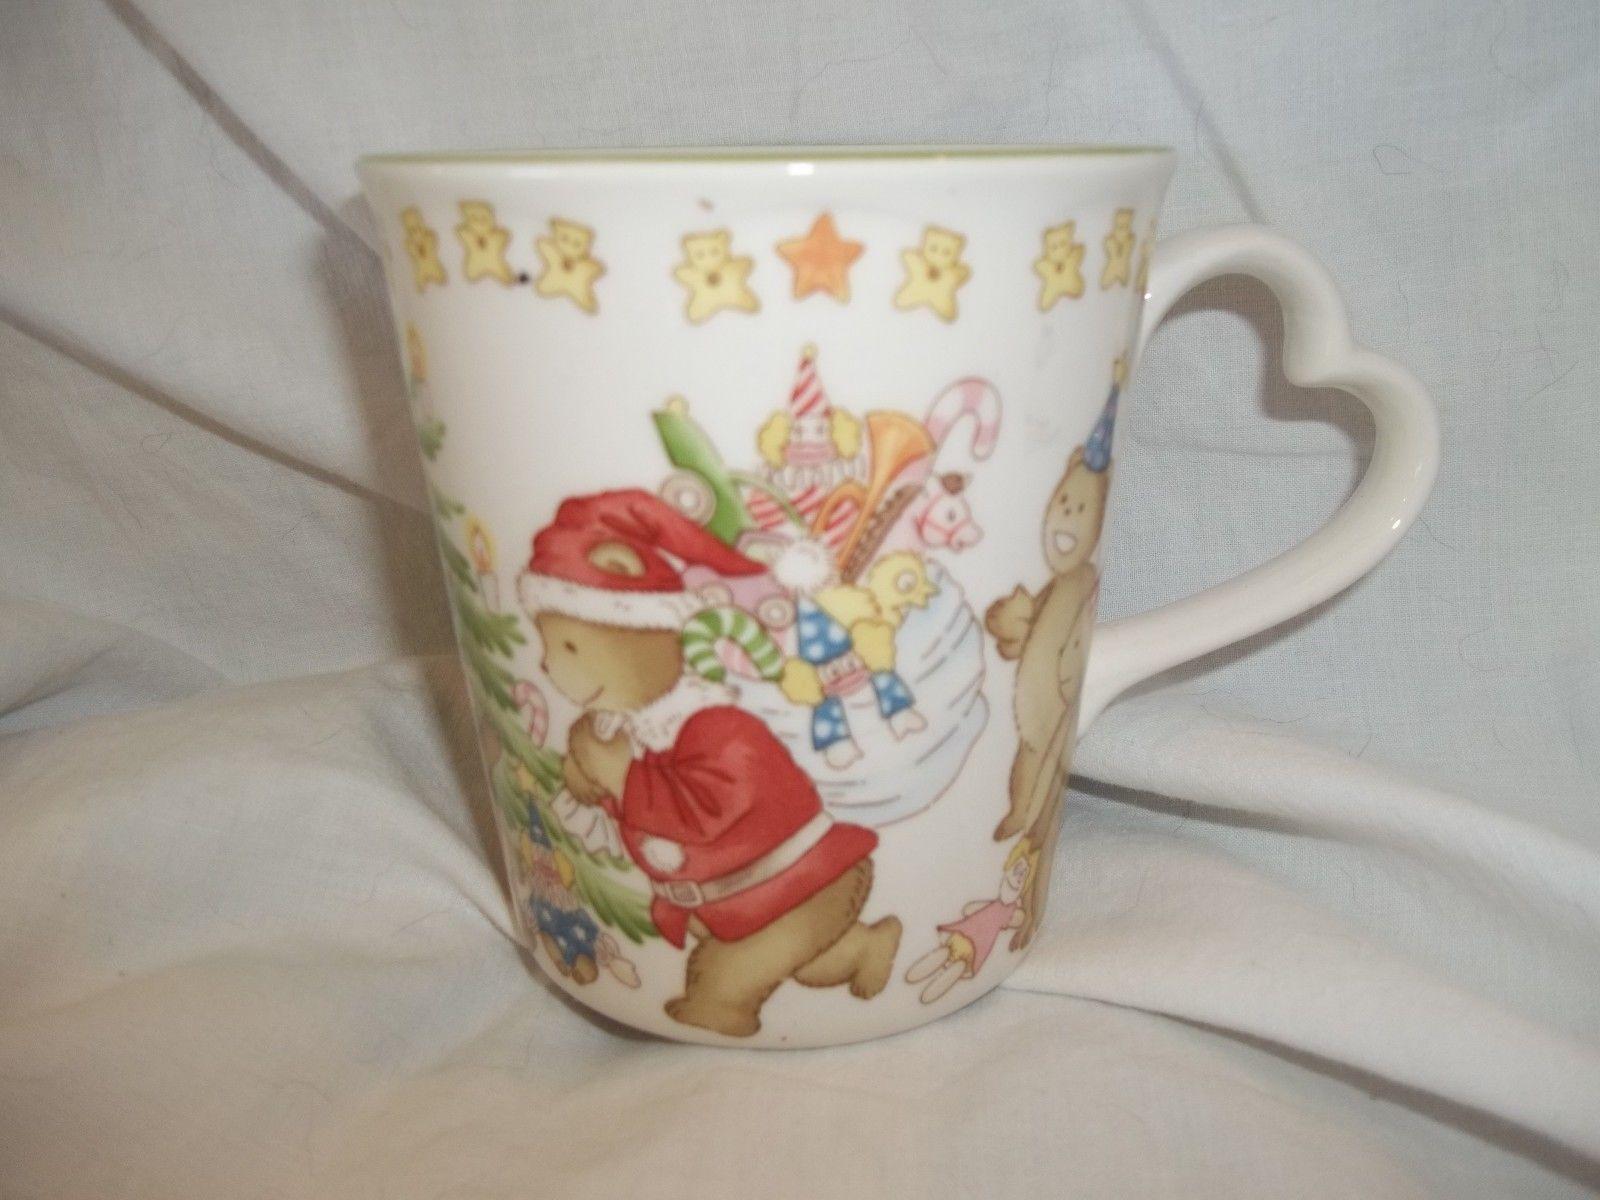 Nikko Japan China Christmas Decoration Cup and 50 similar items